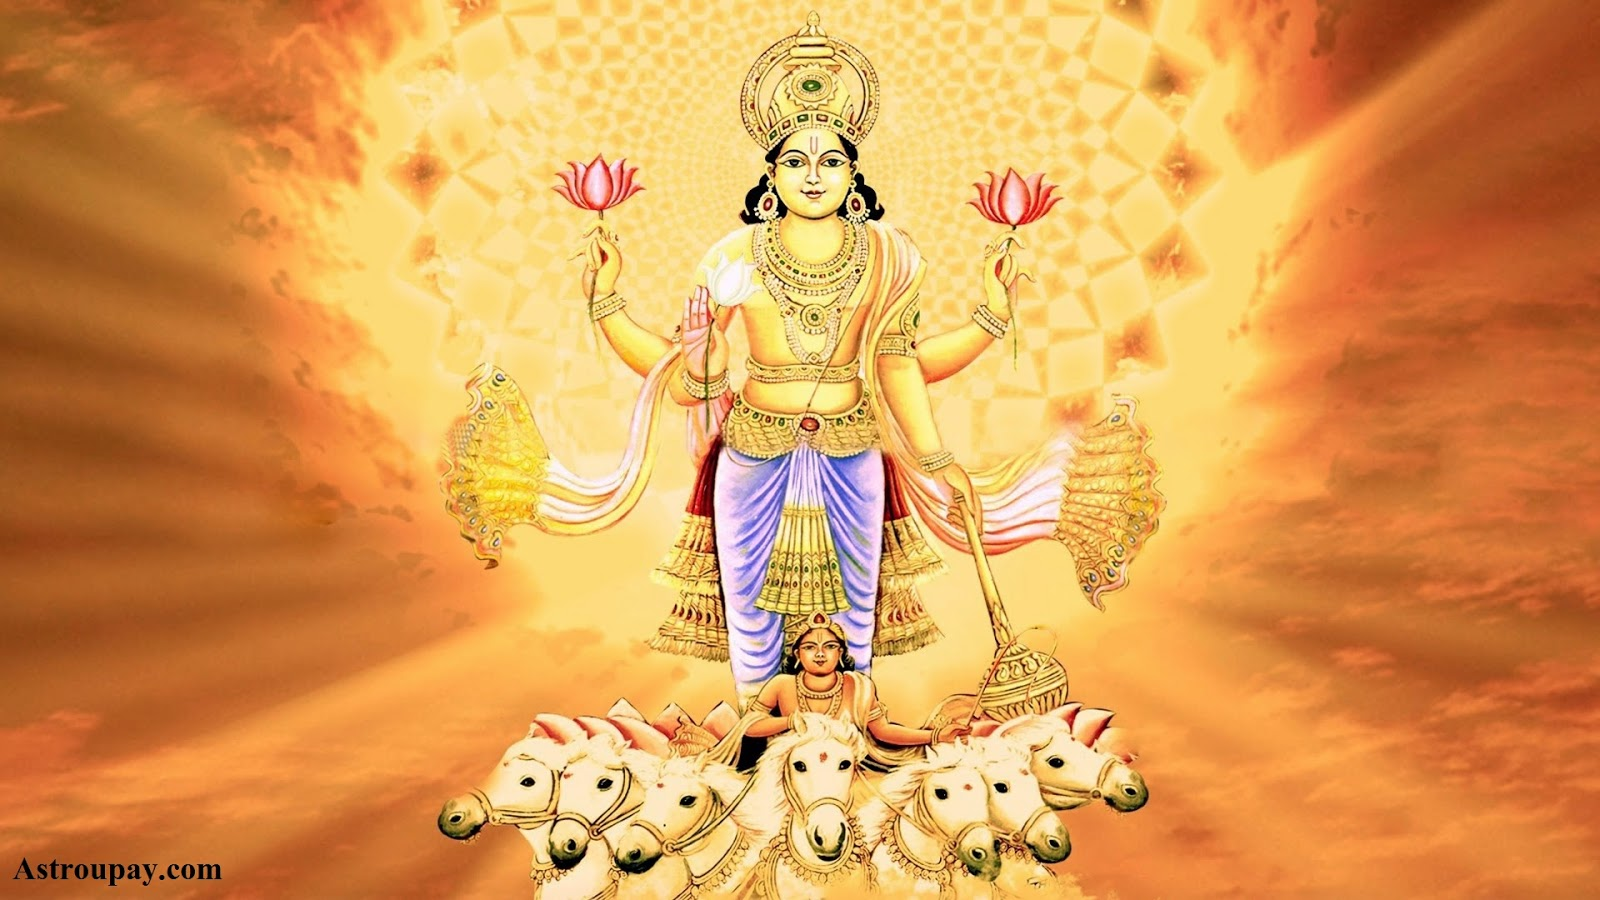 Benefits of Worshiping Surya